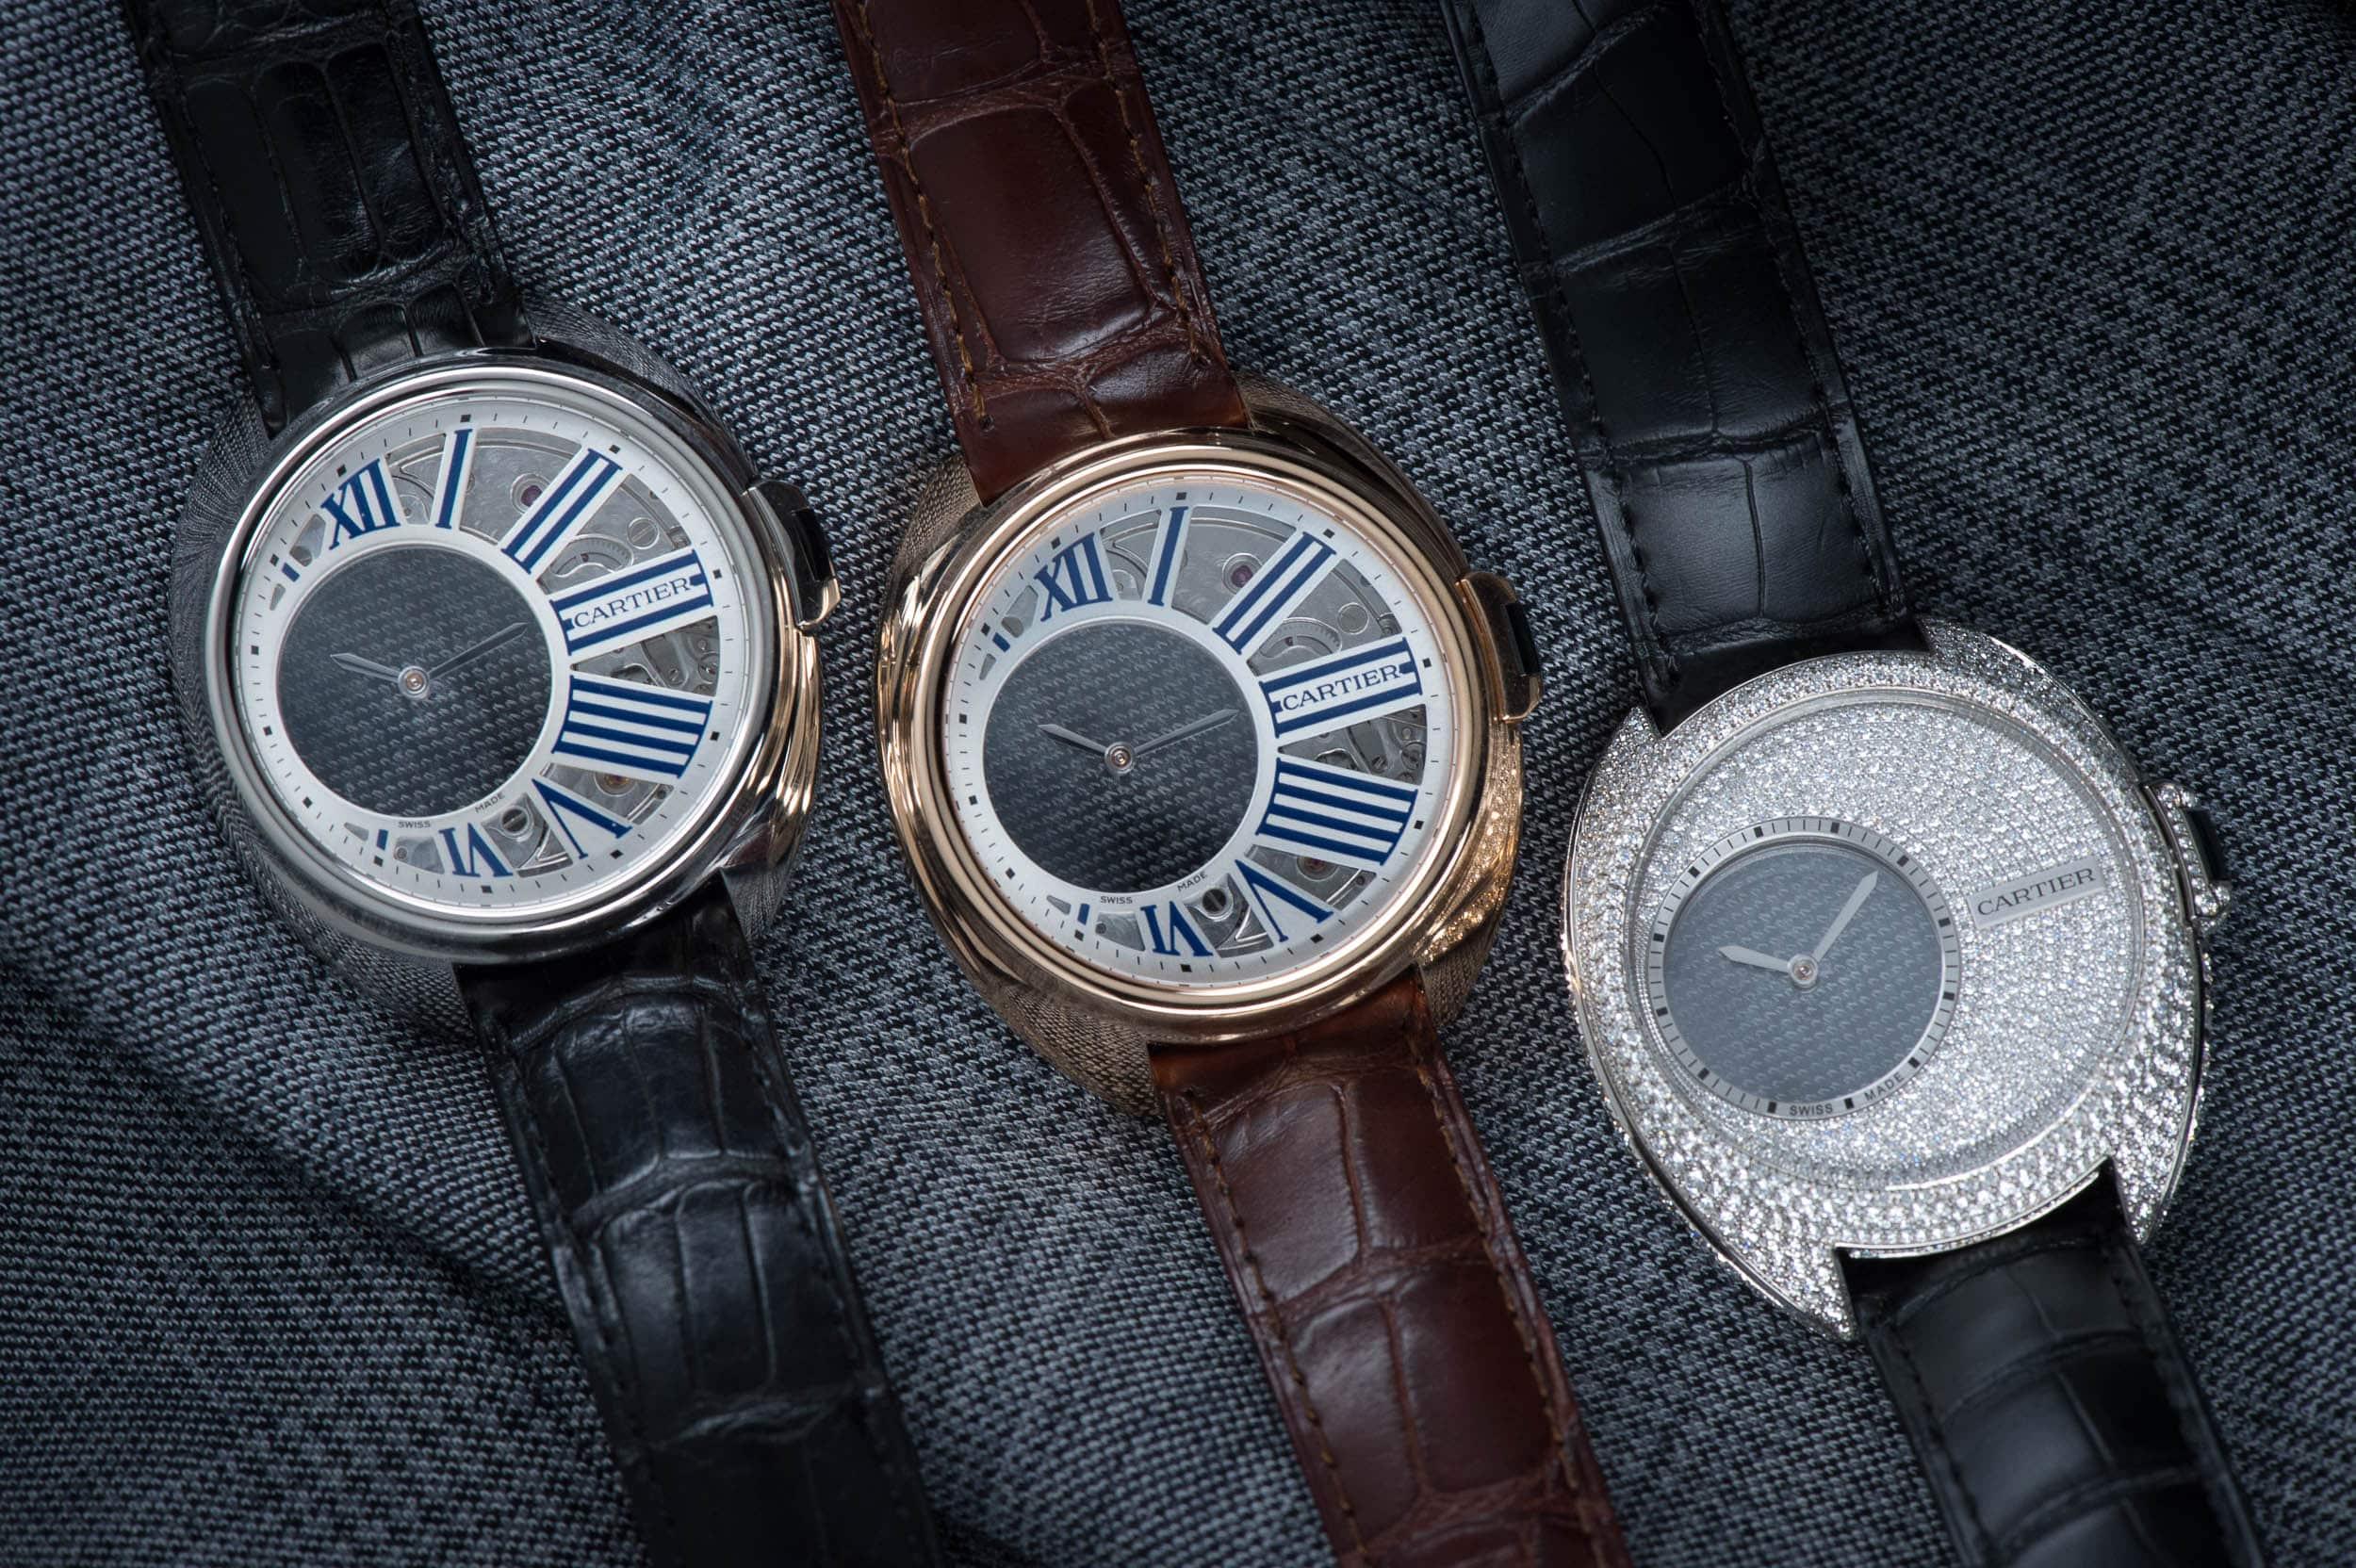 The-Cl---de-Cartier-Mysterious-Hour-Watch